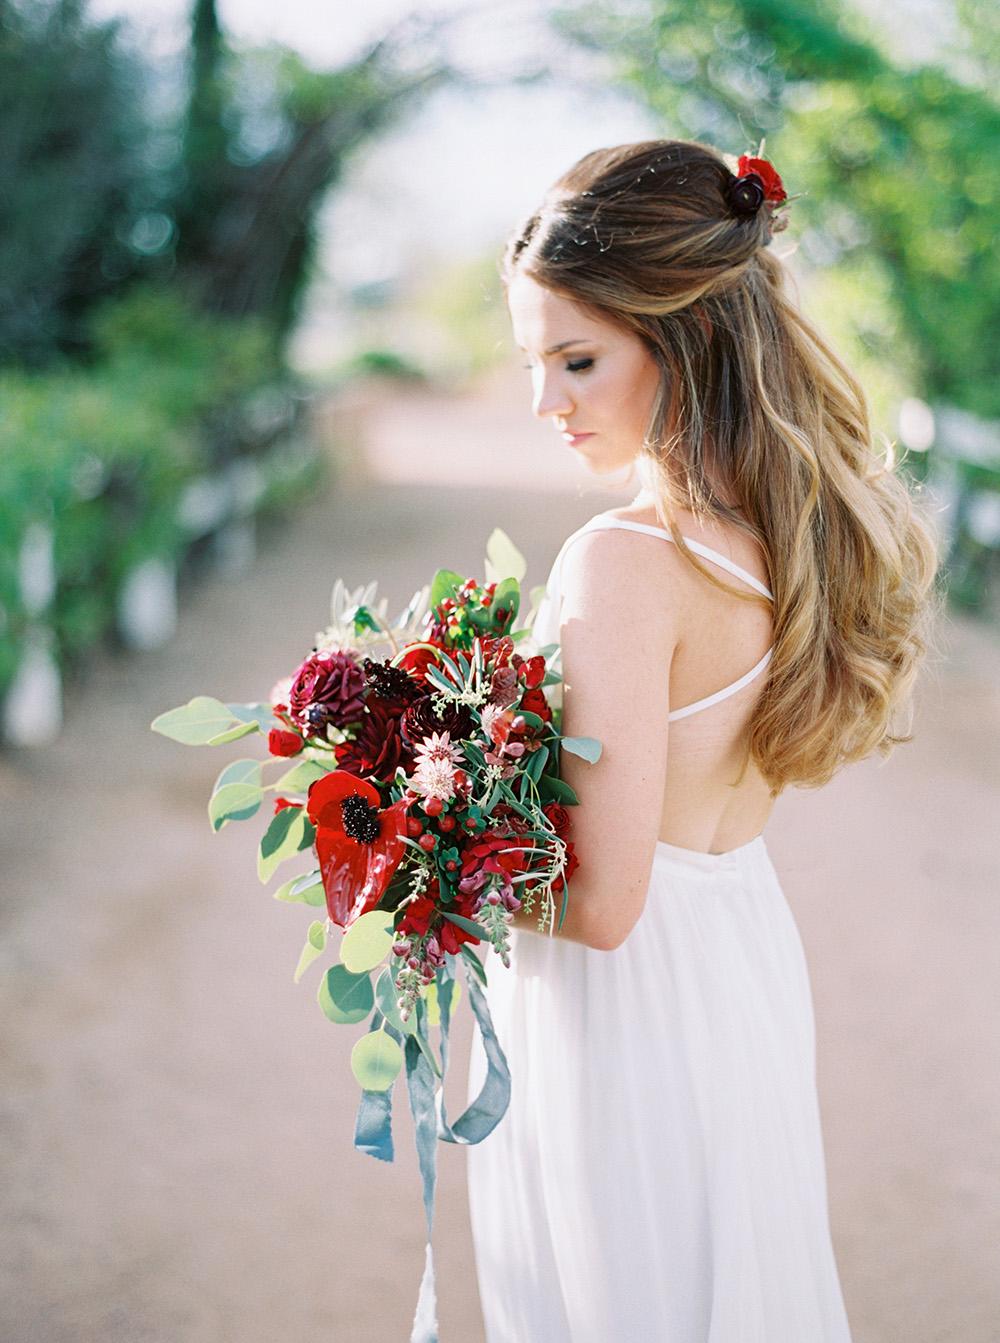 bridal bouquets - photo by Melissa Jill http://ruffledblog.com/fruit-filled-vineyard-wedding-inspiration